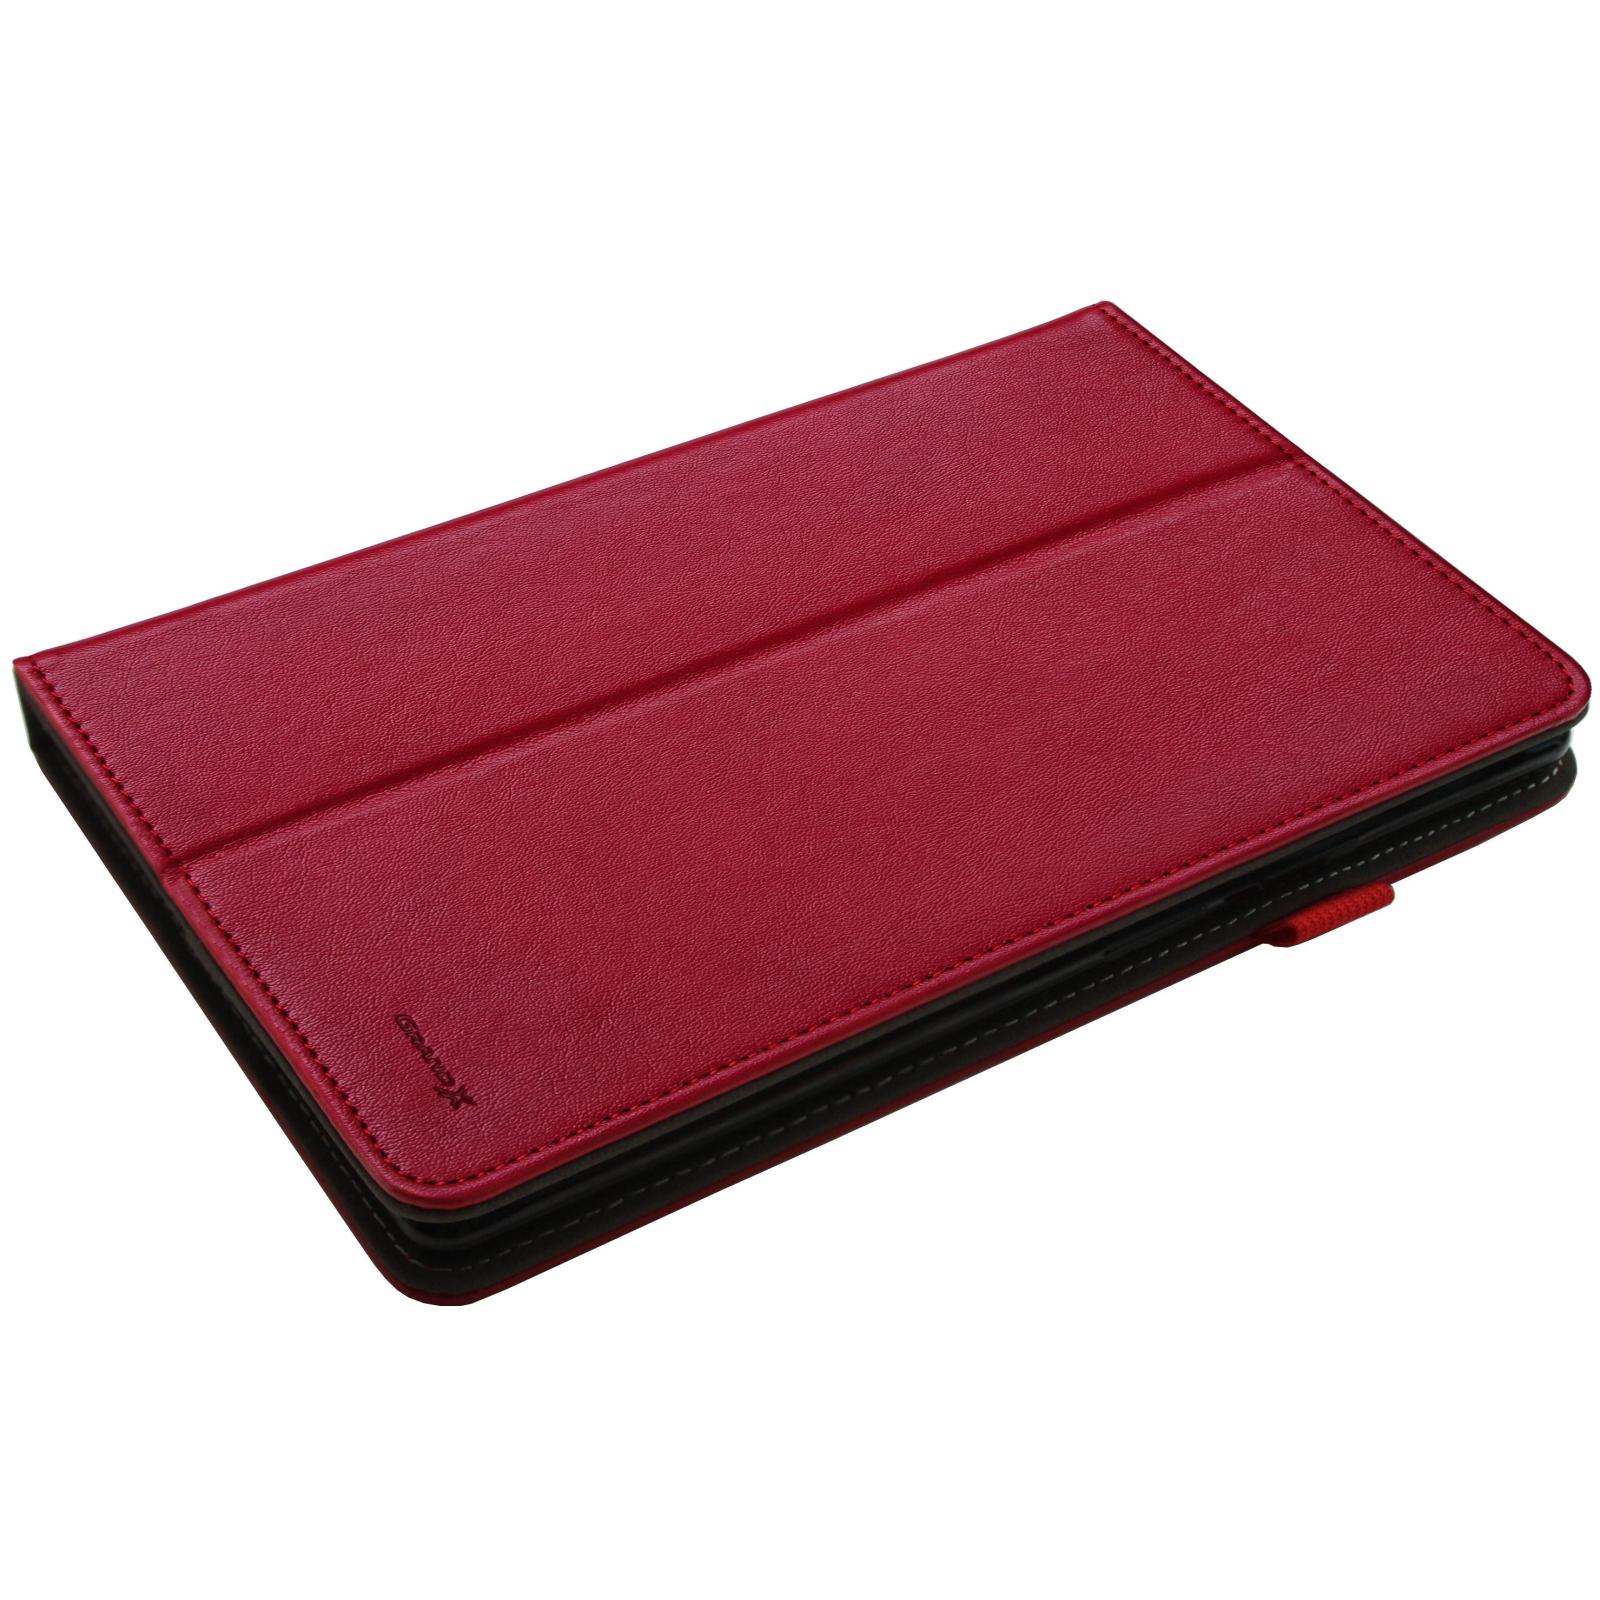 Чехол для планшета Grand-X для Lenovo TAB4 8 Plus TB-8704 Business Class Red (LTC-LT48PBR) изображение 2